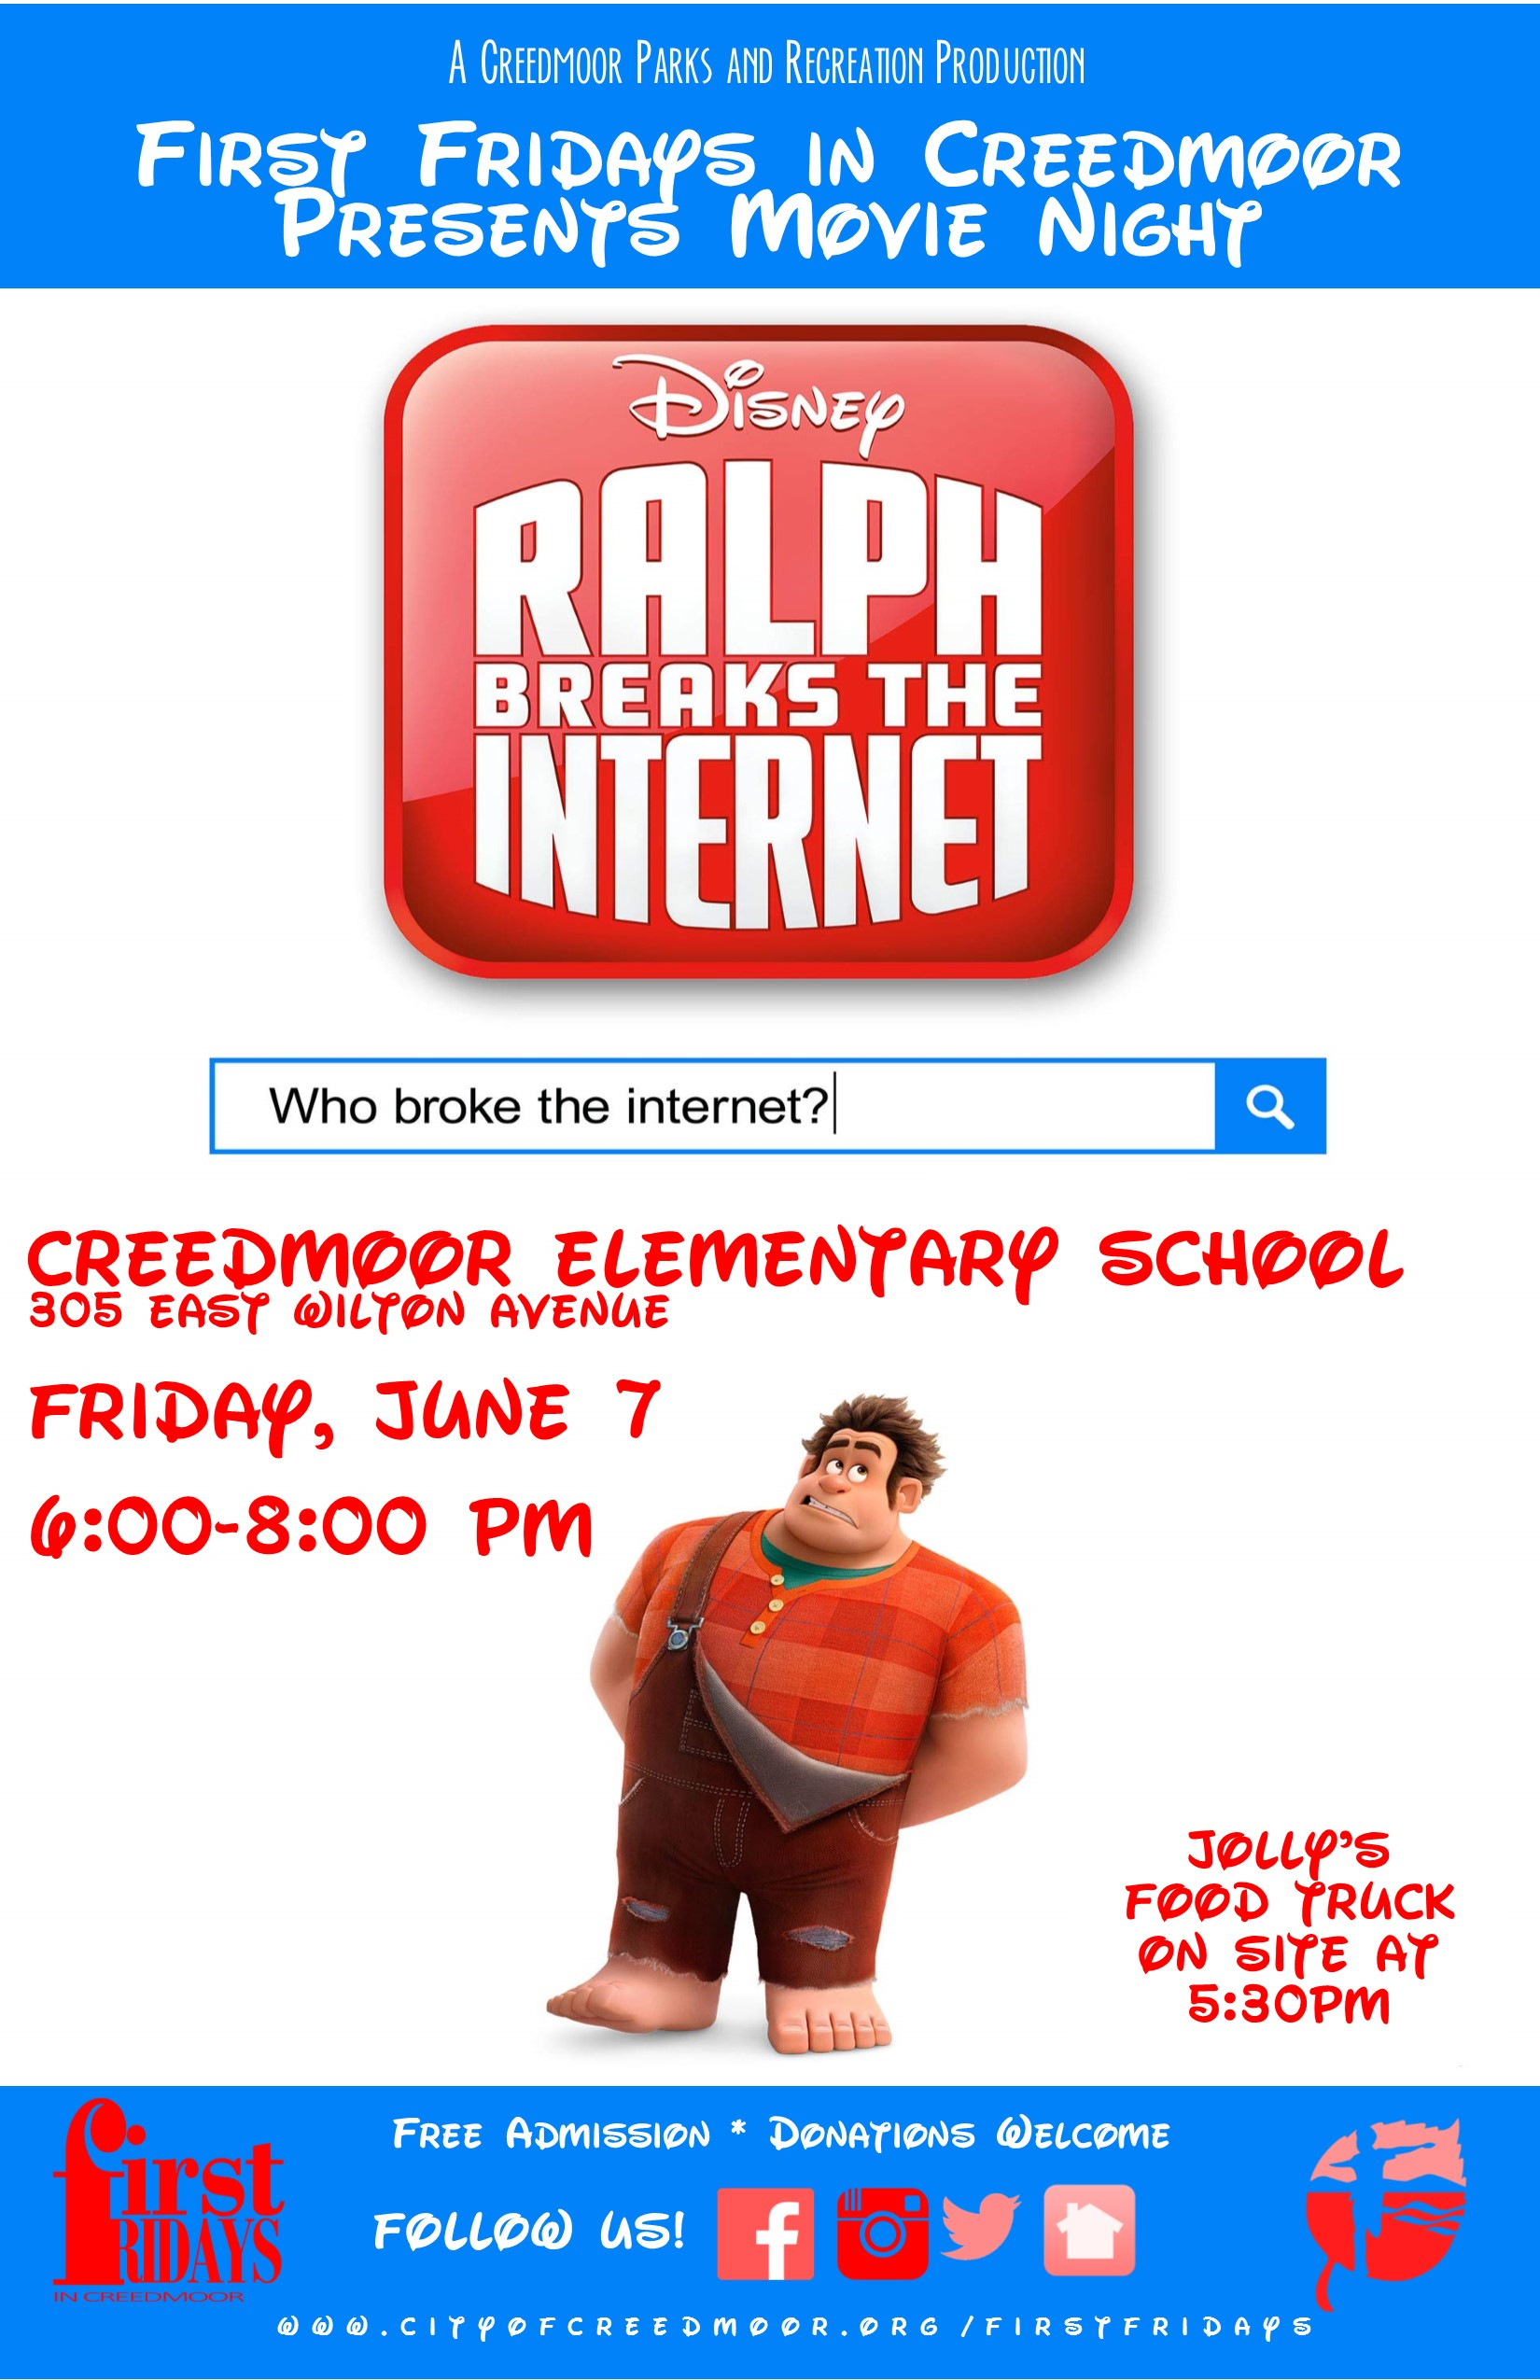 First Fridays in Creedmoor // Movie Night at Creedmoor